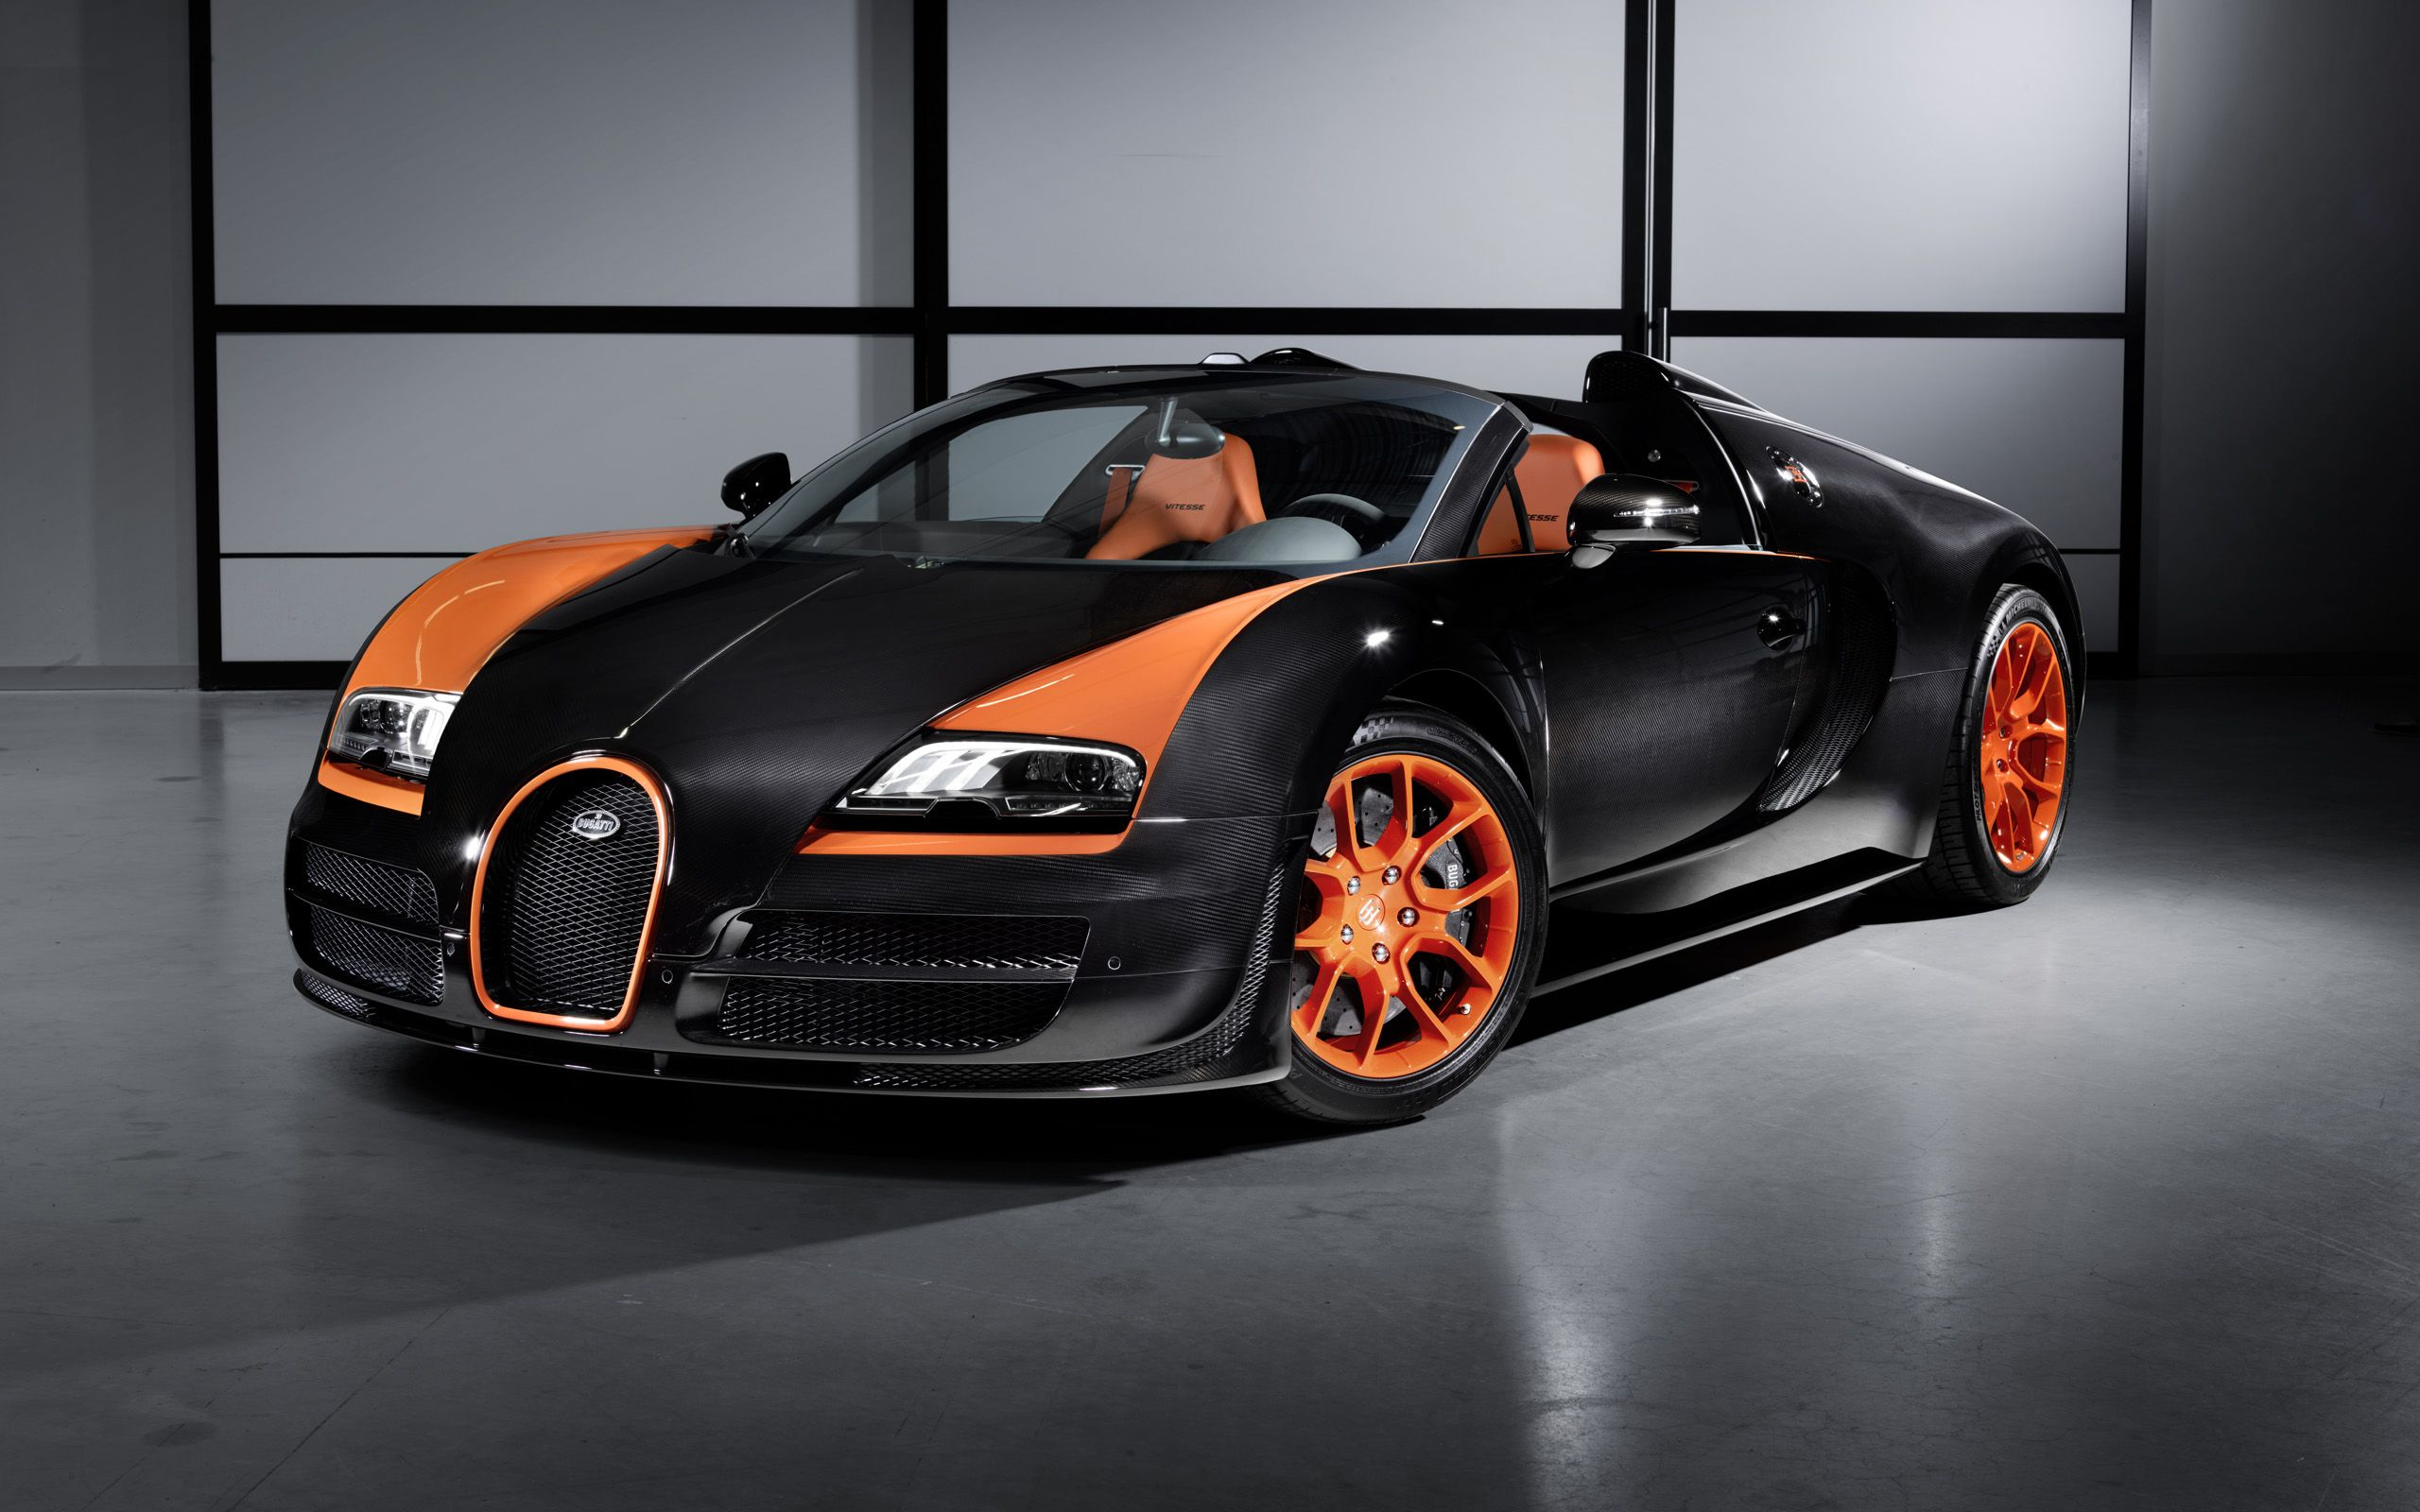 de6cc8063a985e4799780e8506a967ee Extraordinary Bugatti Veyron Grand Sport Vitesse Real Racing 3 Cars Trend